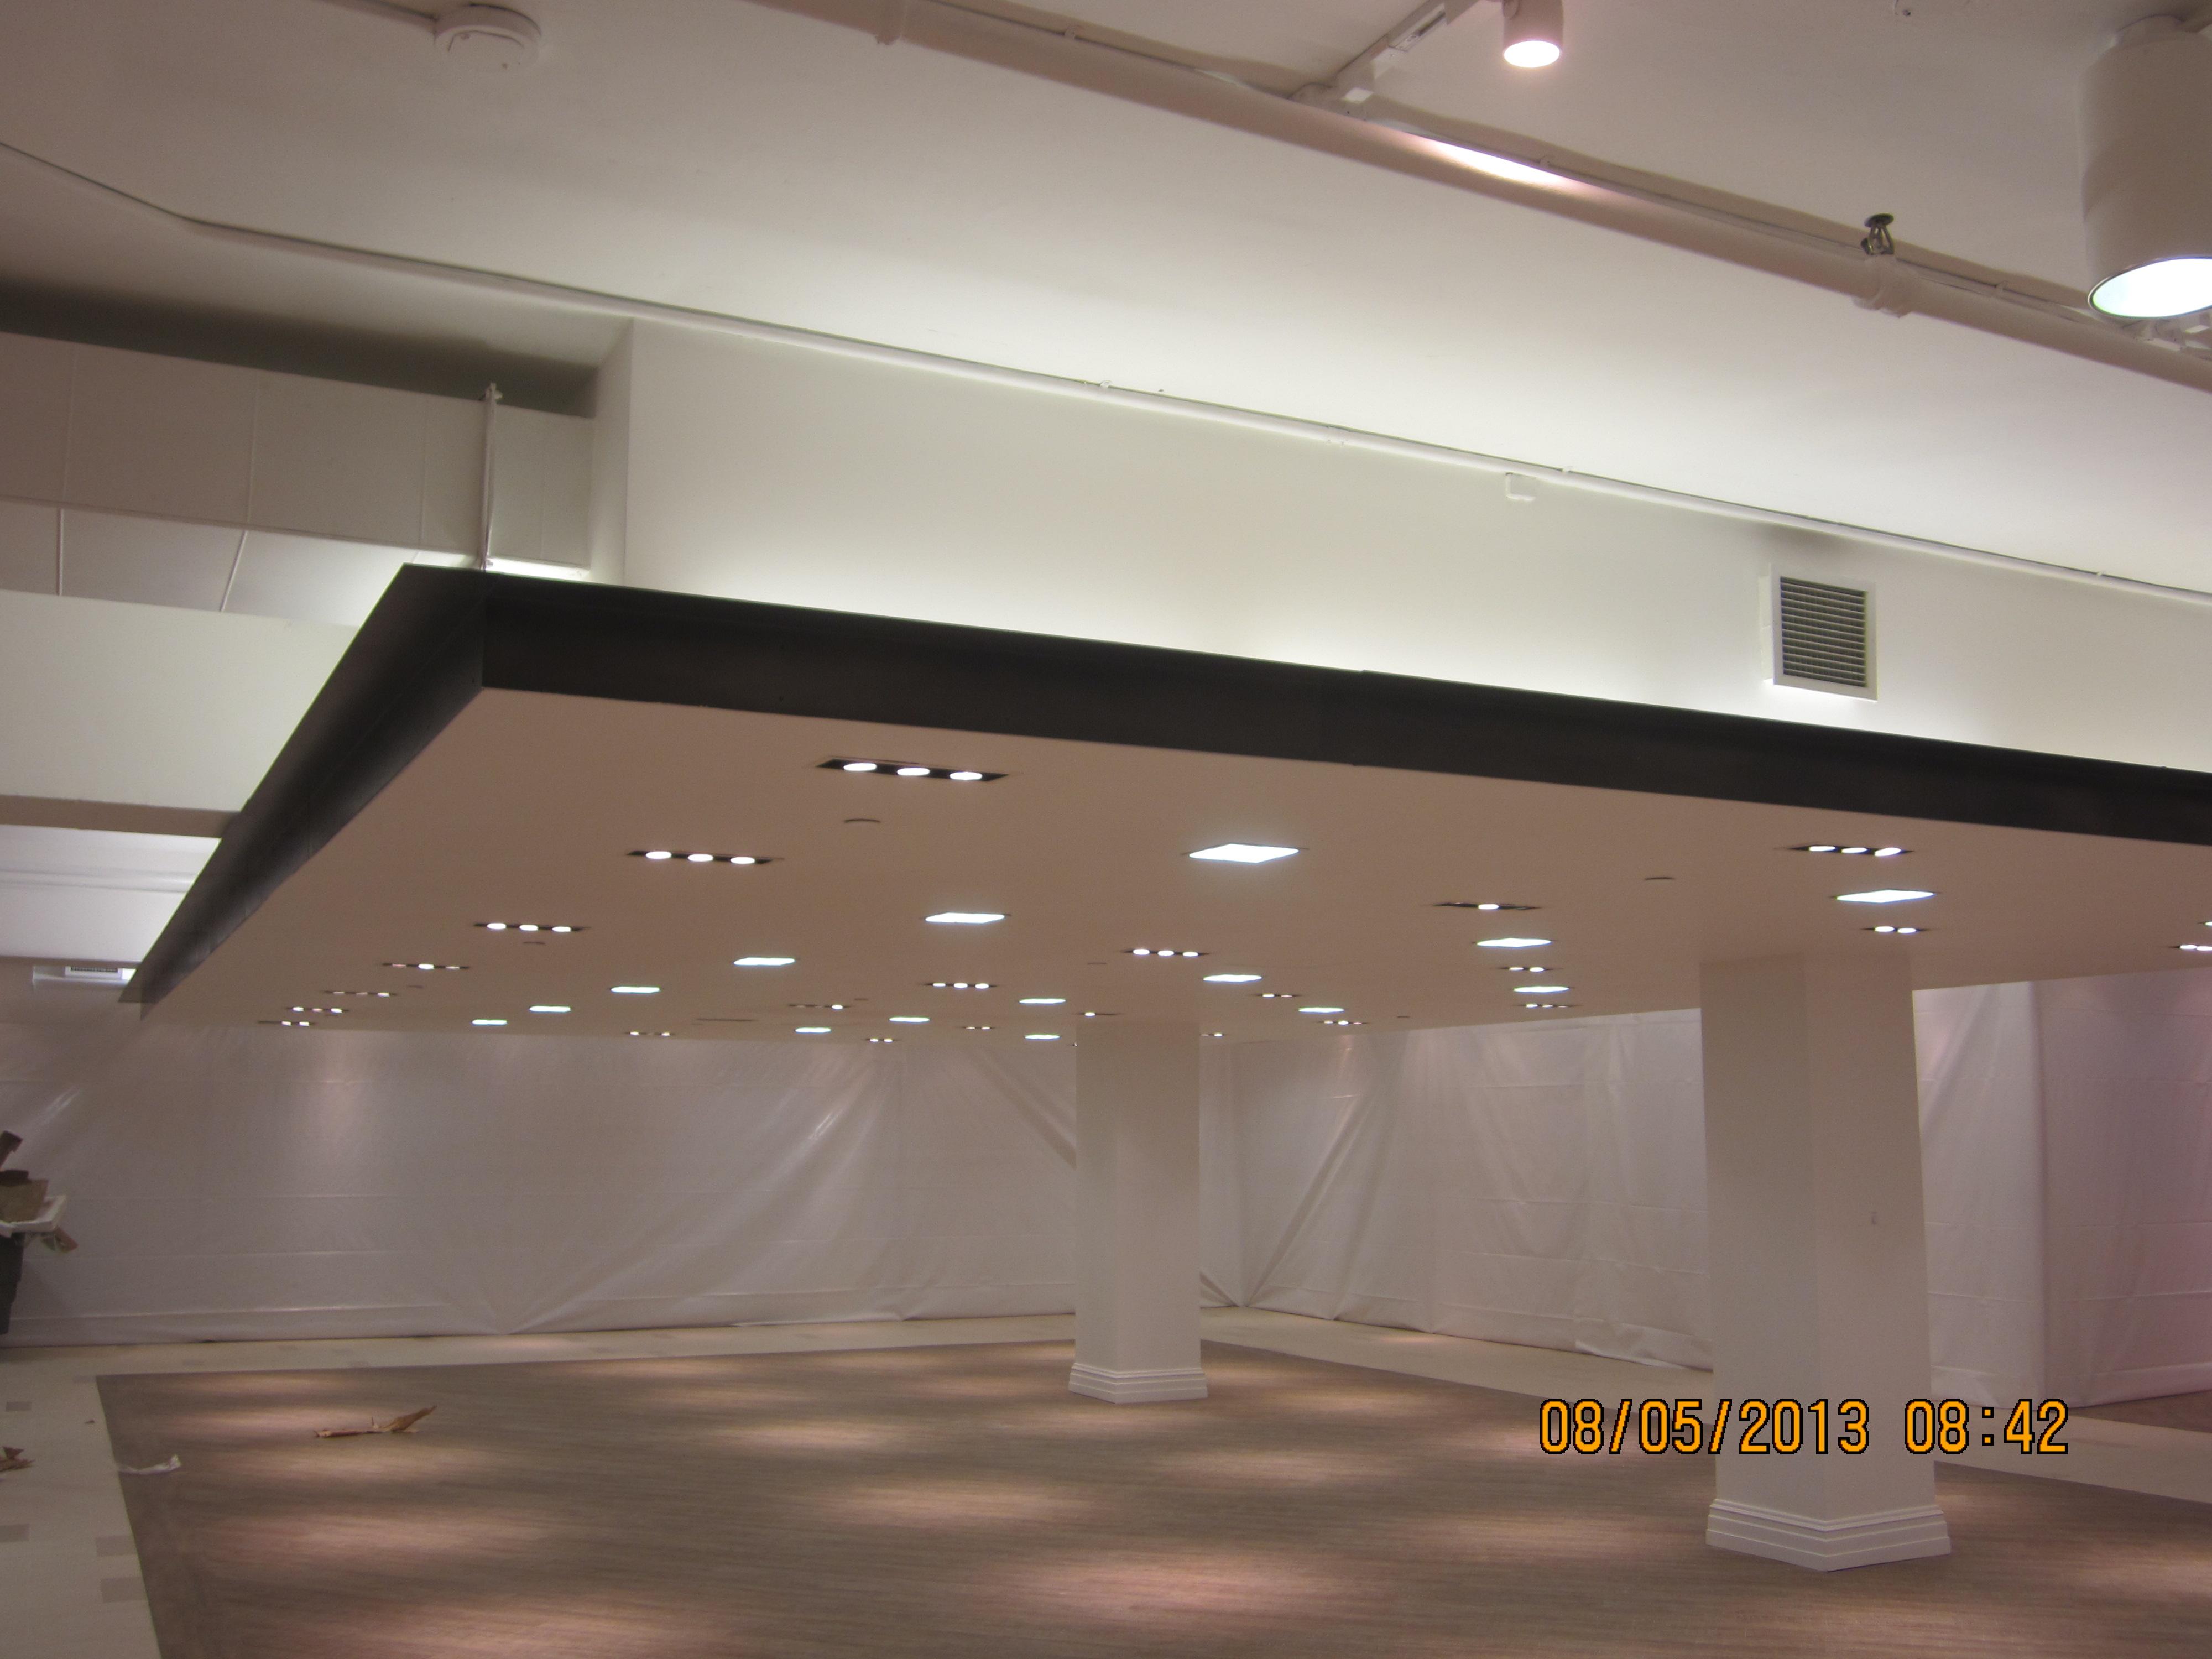 Cloud ceilings - Level 5 finish